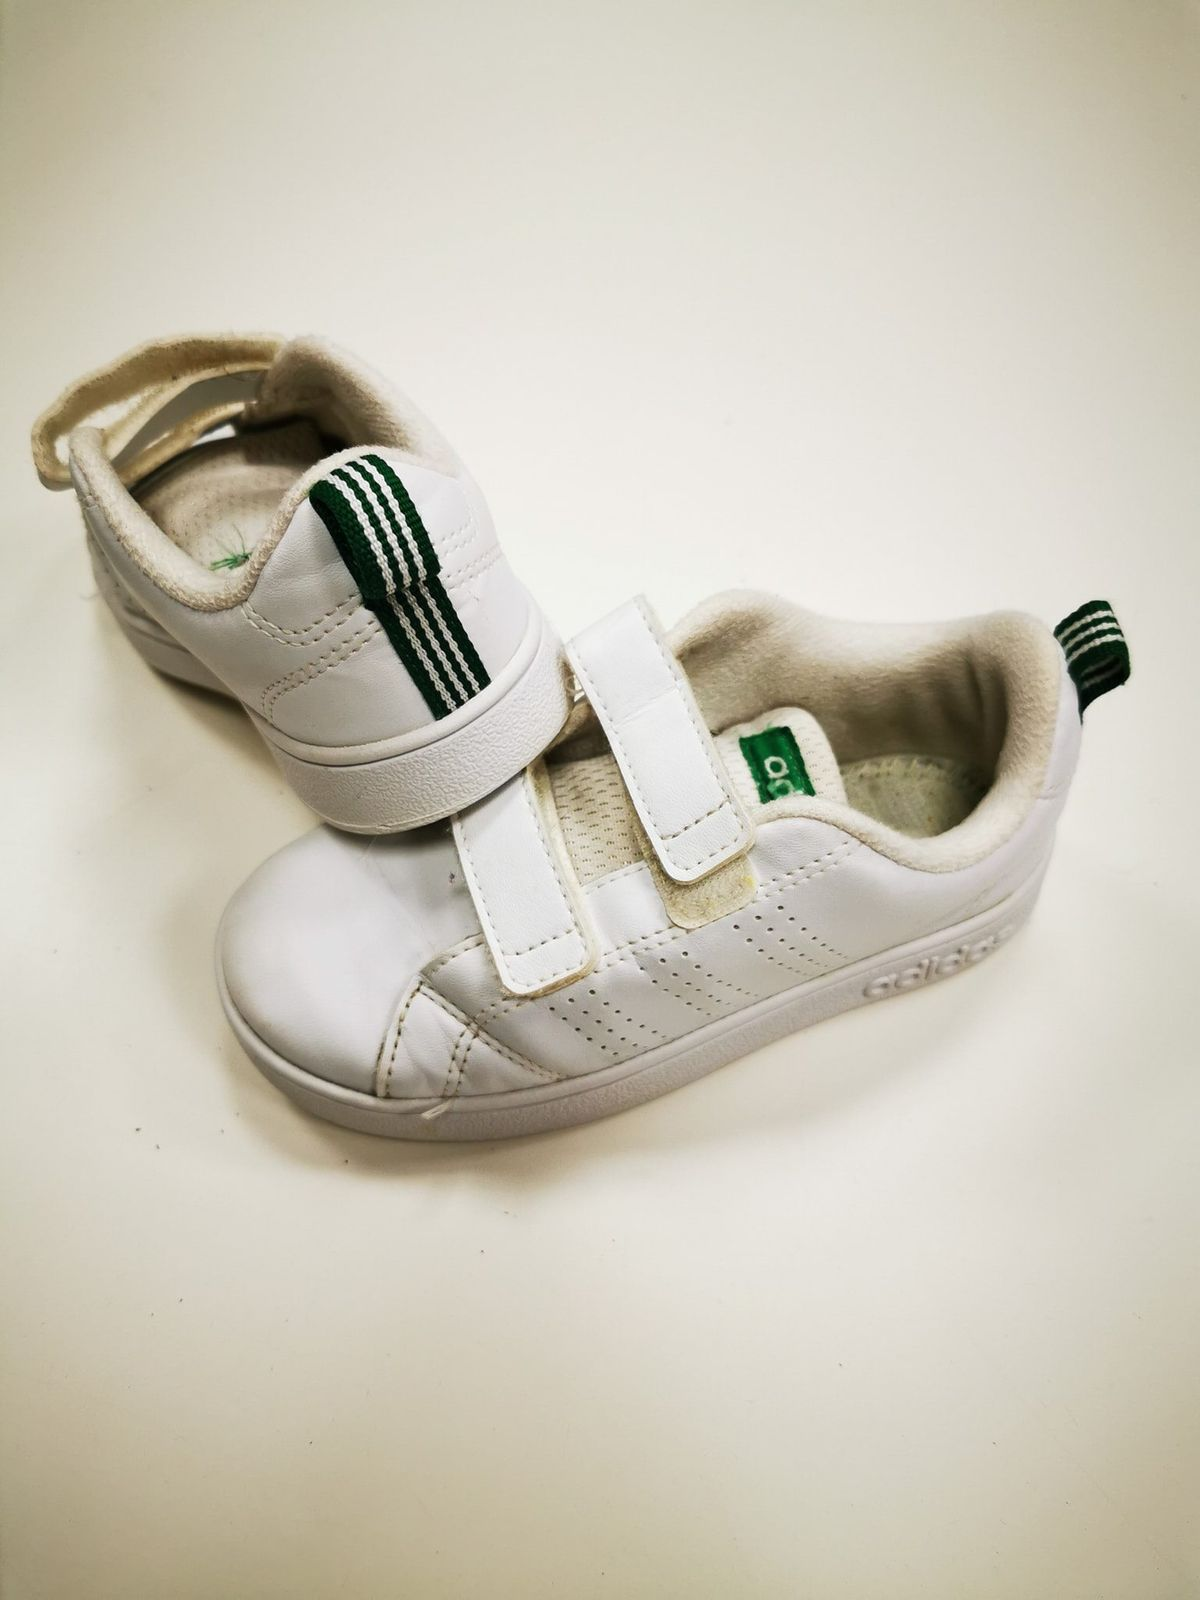 Adidas bianche N 27 11645 Euro 15,00